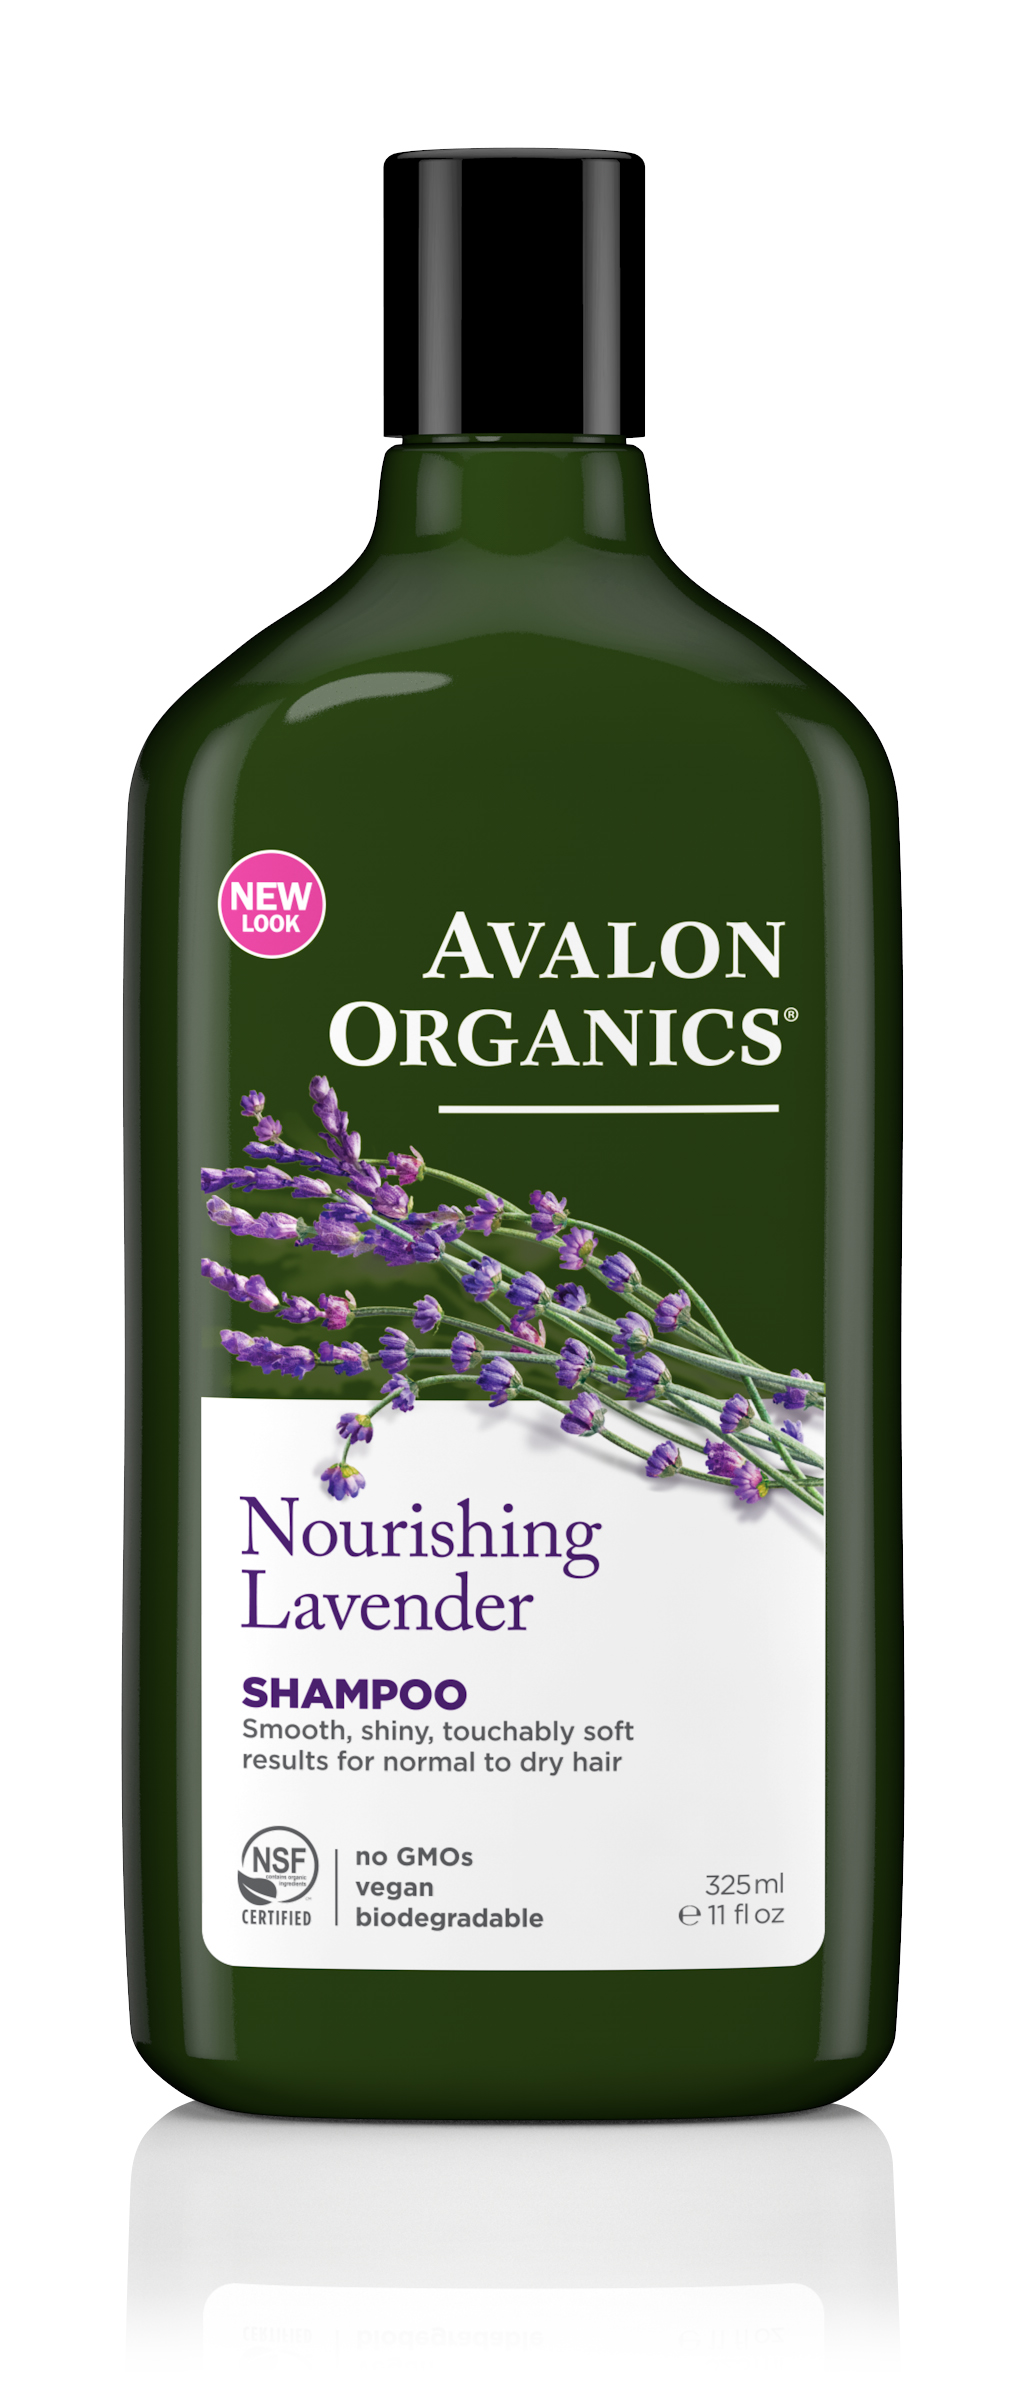 Avalon Organics Lavender Shampoo